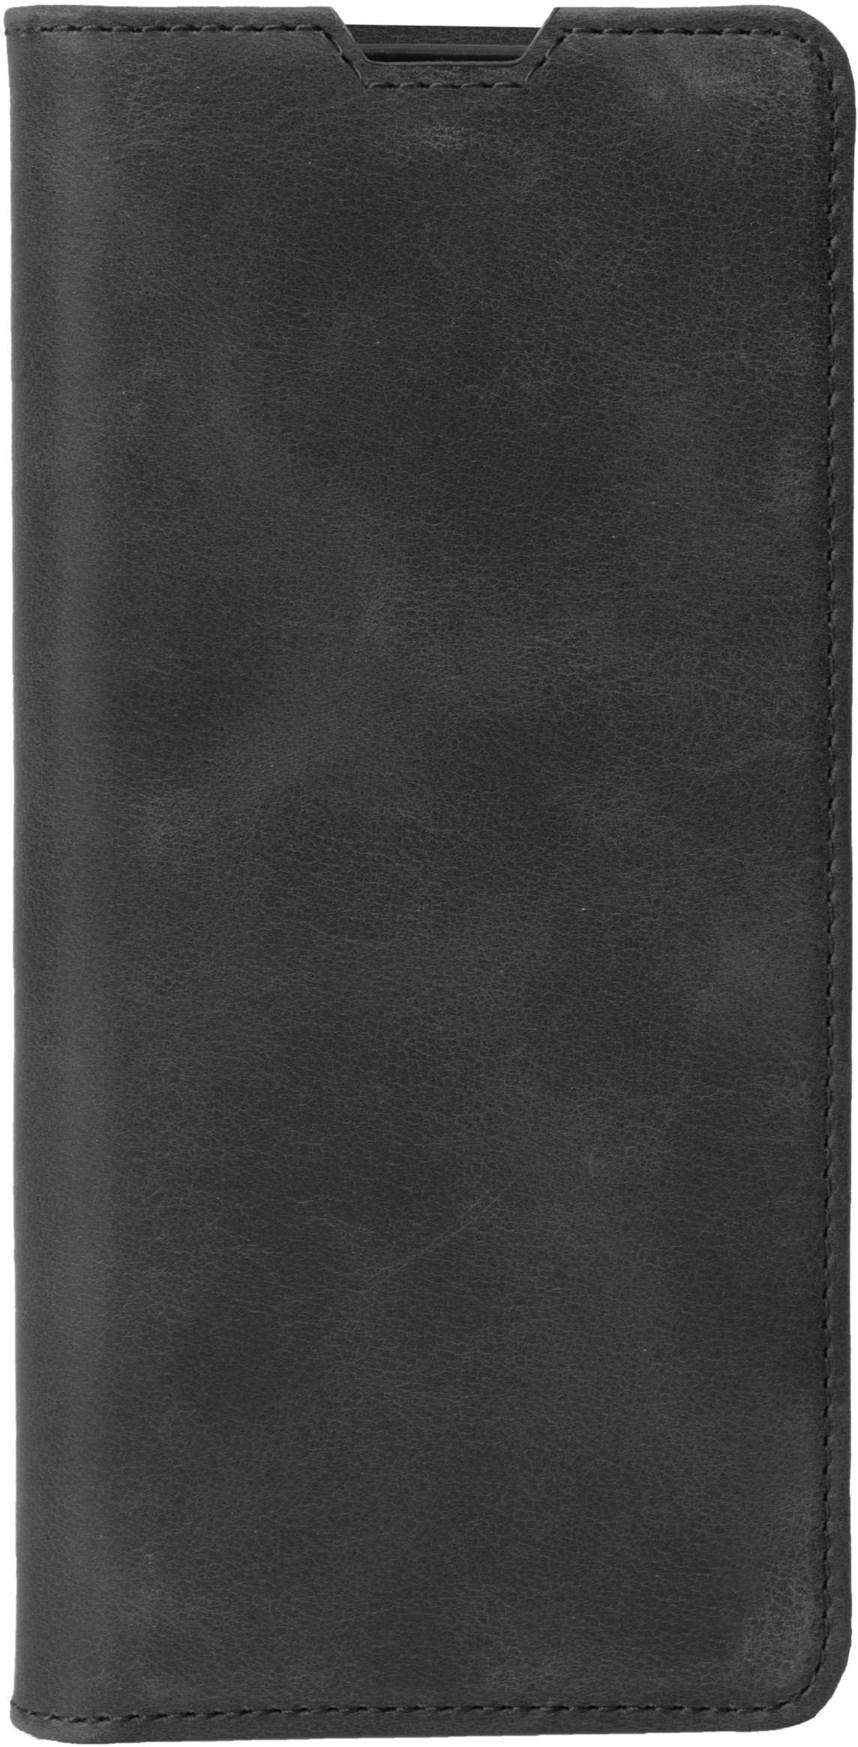 Krusell Sunne 2 Card Foliowallet Samsung Galaxy S10e Vintage Black